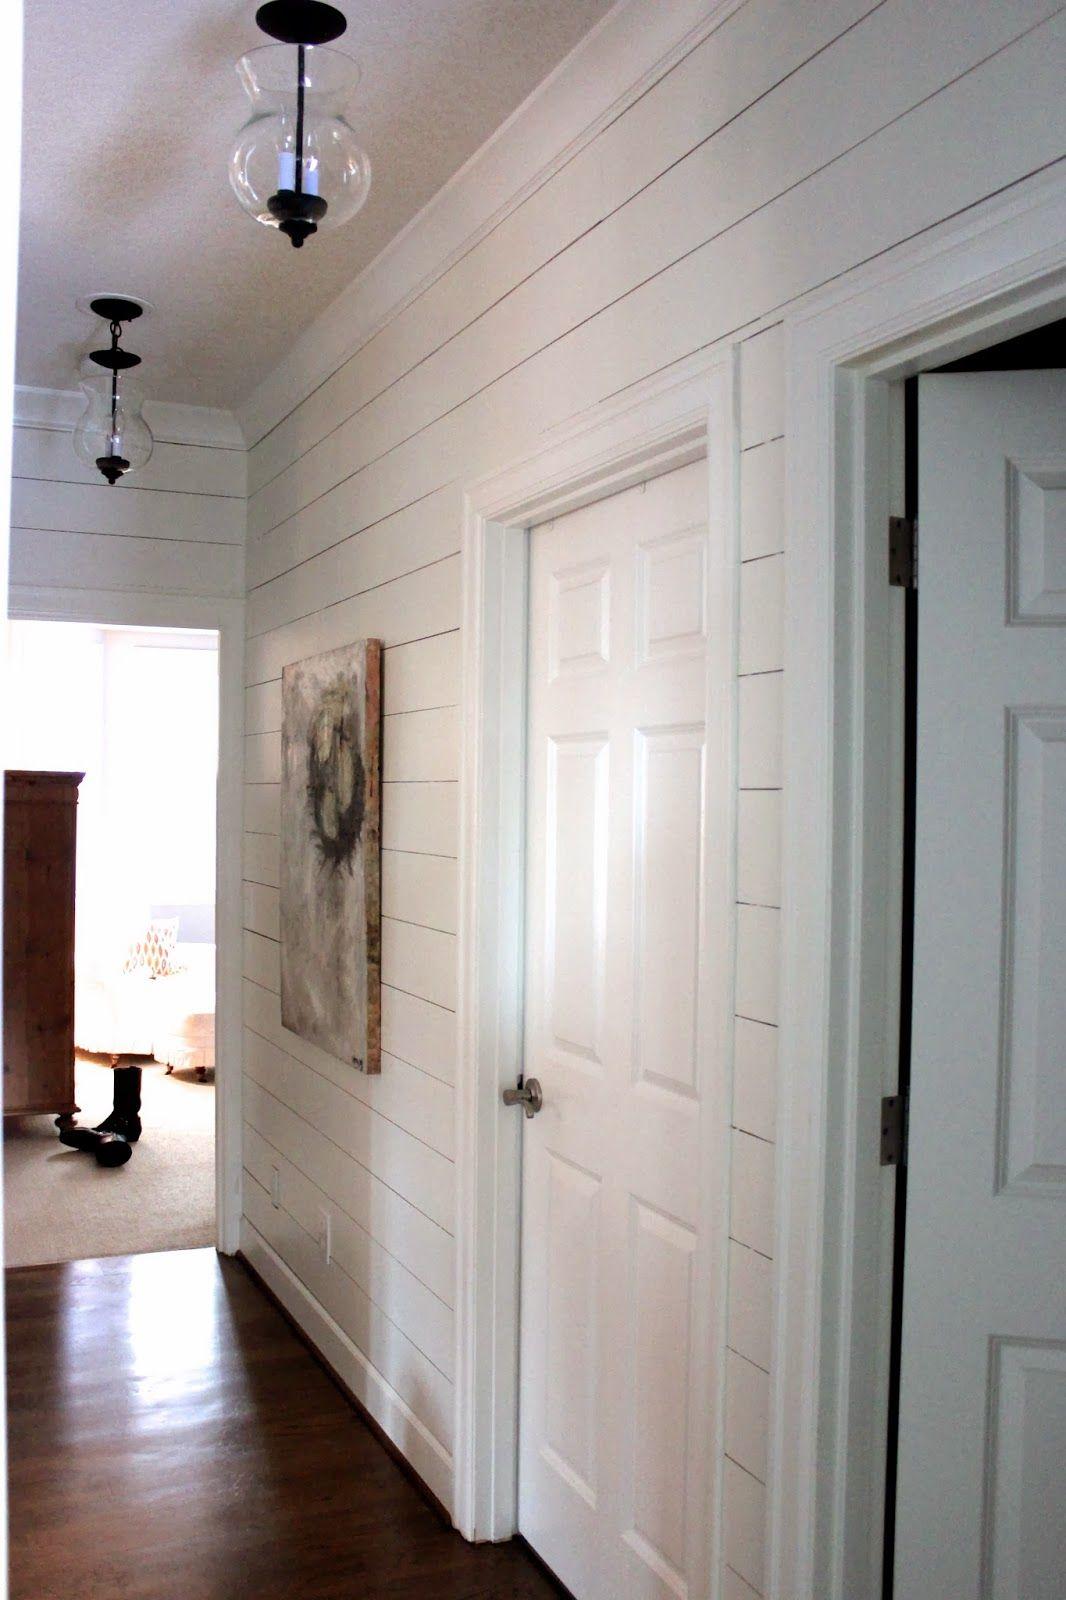 Forever Cottage Planked Wall Hallway Gets New Light Fixtures Cottage Lighting Pinterest